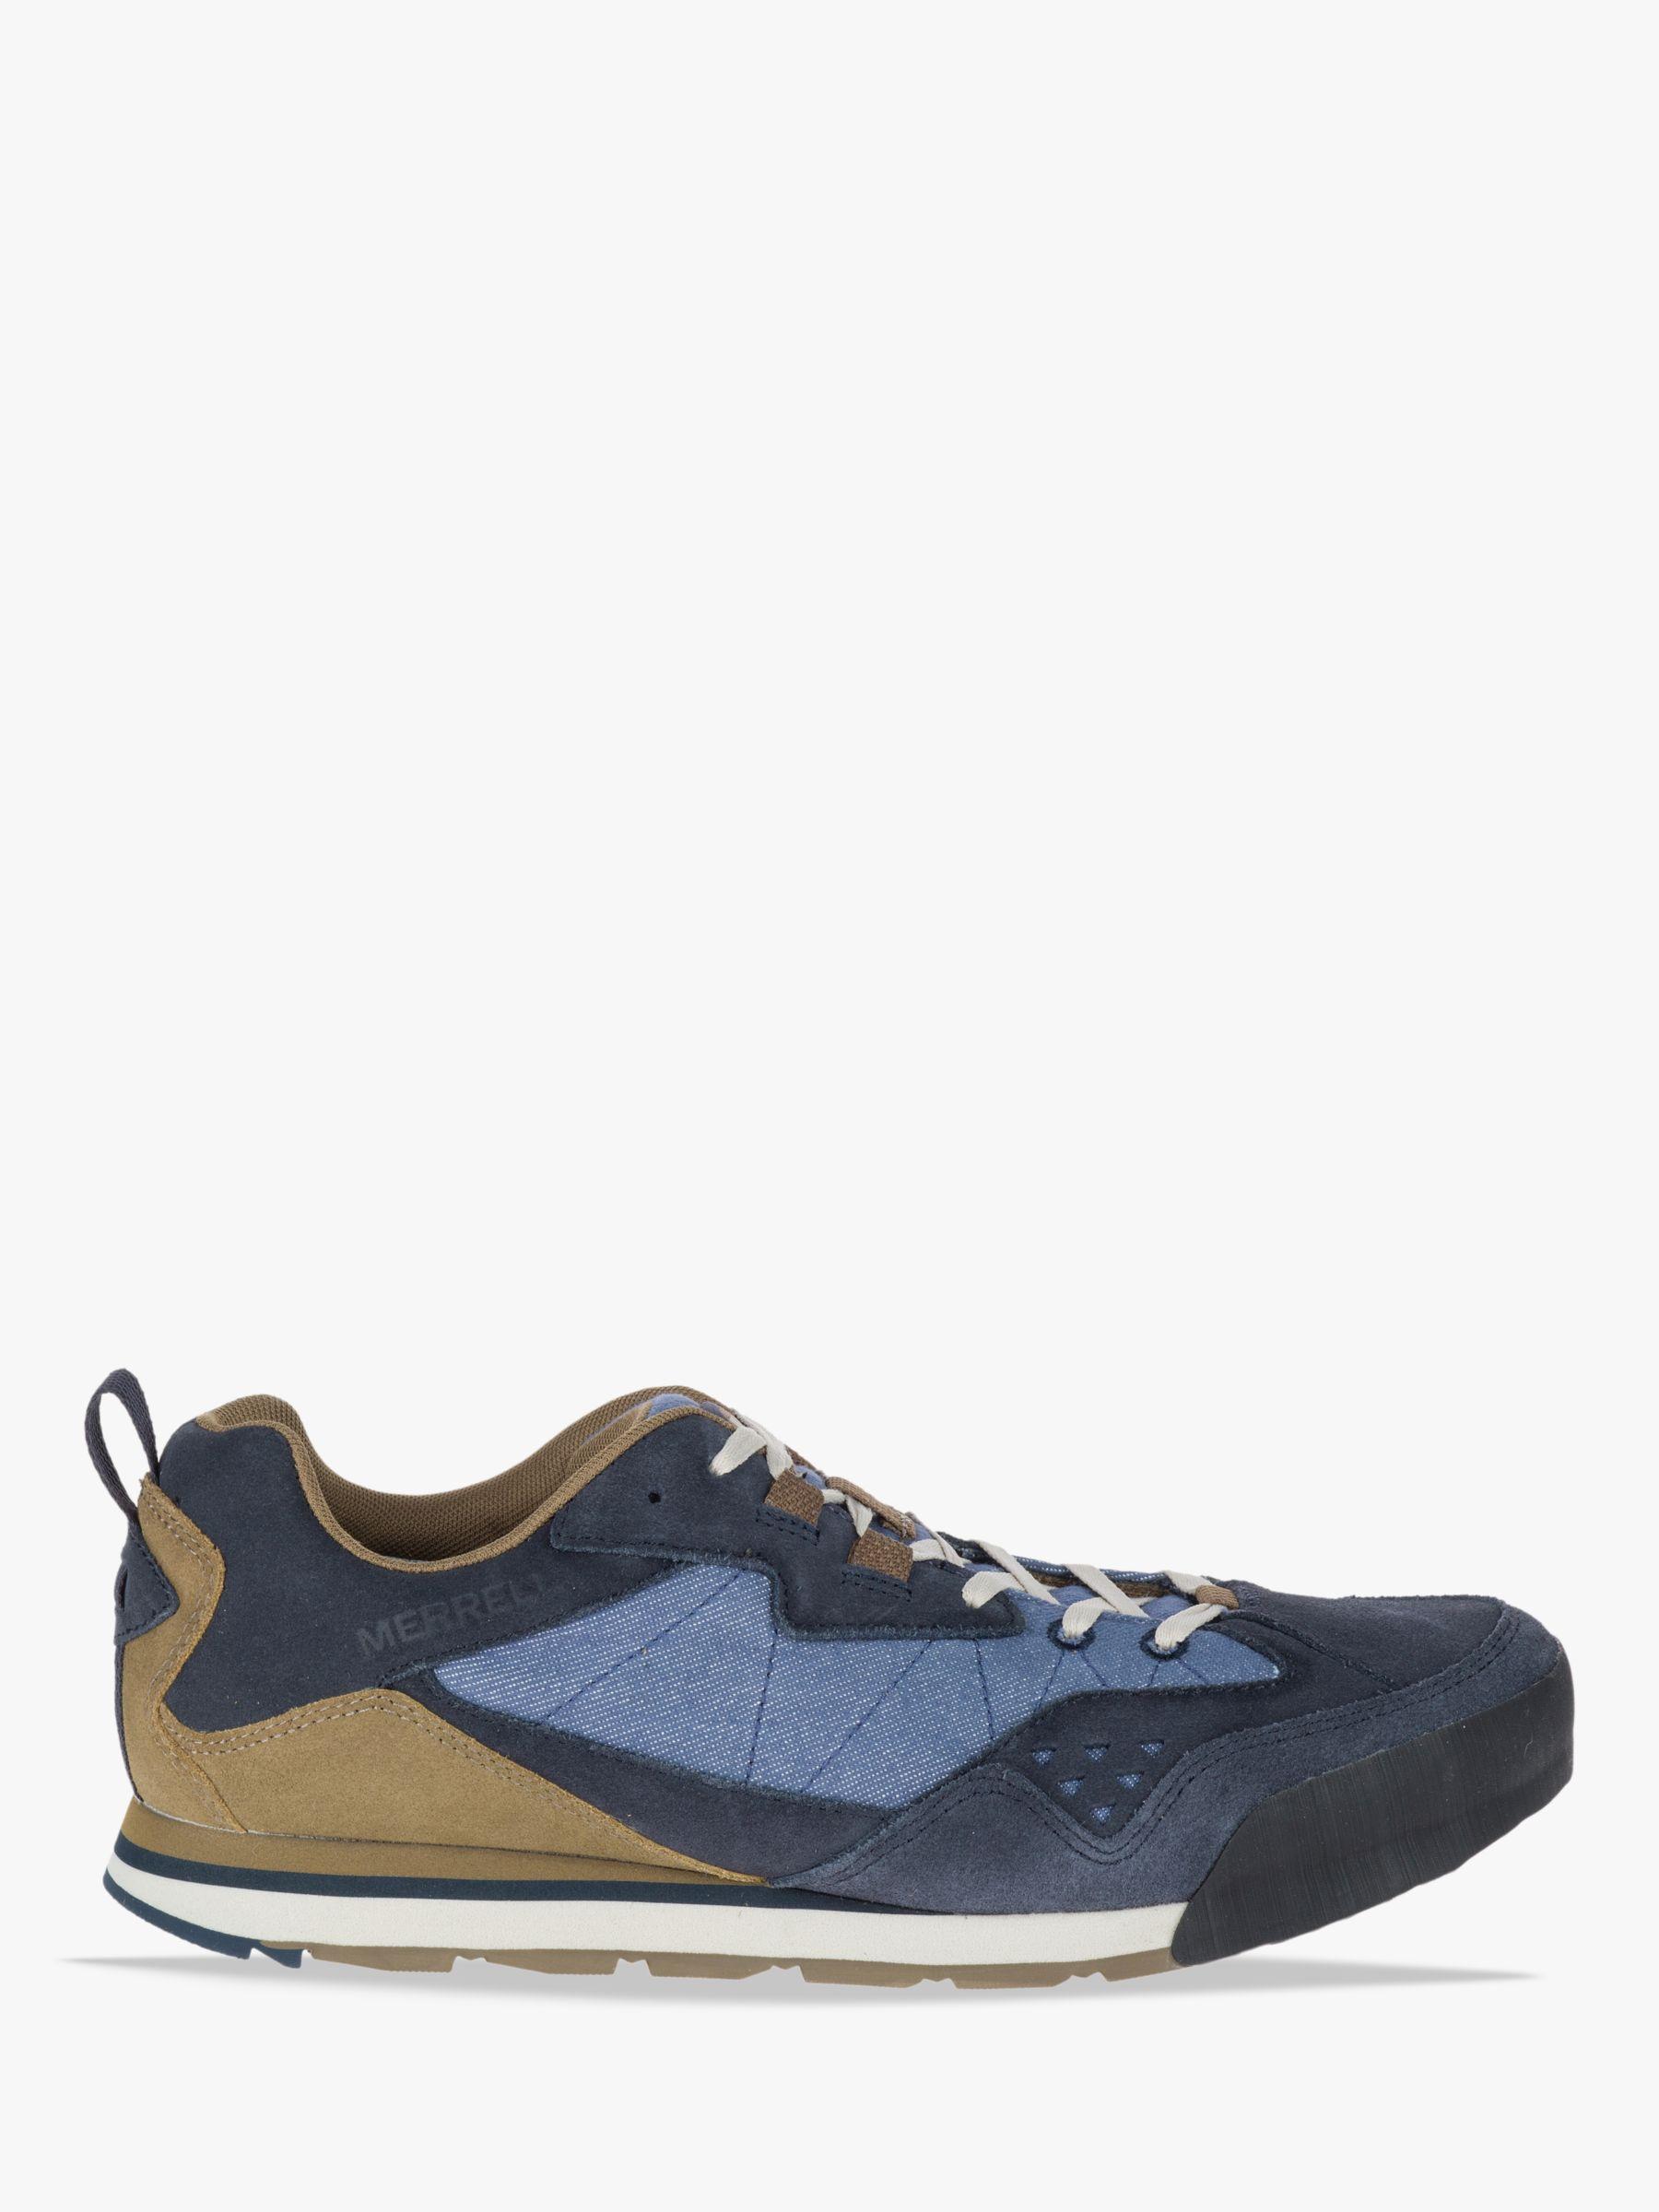 110a1f972a4c7 Merrell Burnt Rock Men's Shoes, Kangaroo/Denim Blue at John Lewis & Partners